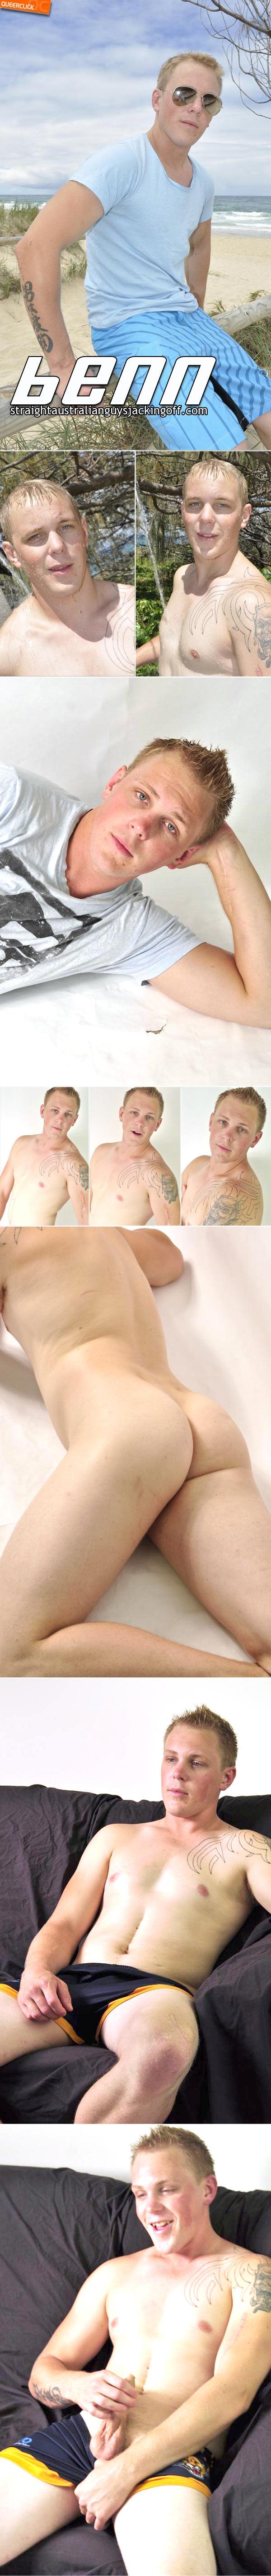 The anatomy of an orgasm